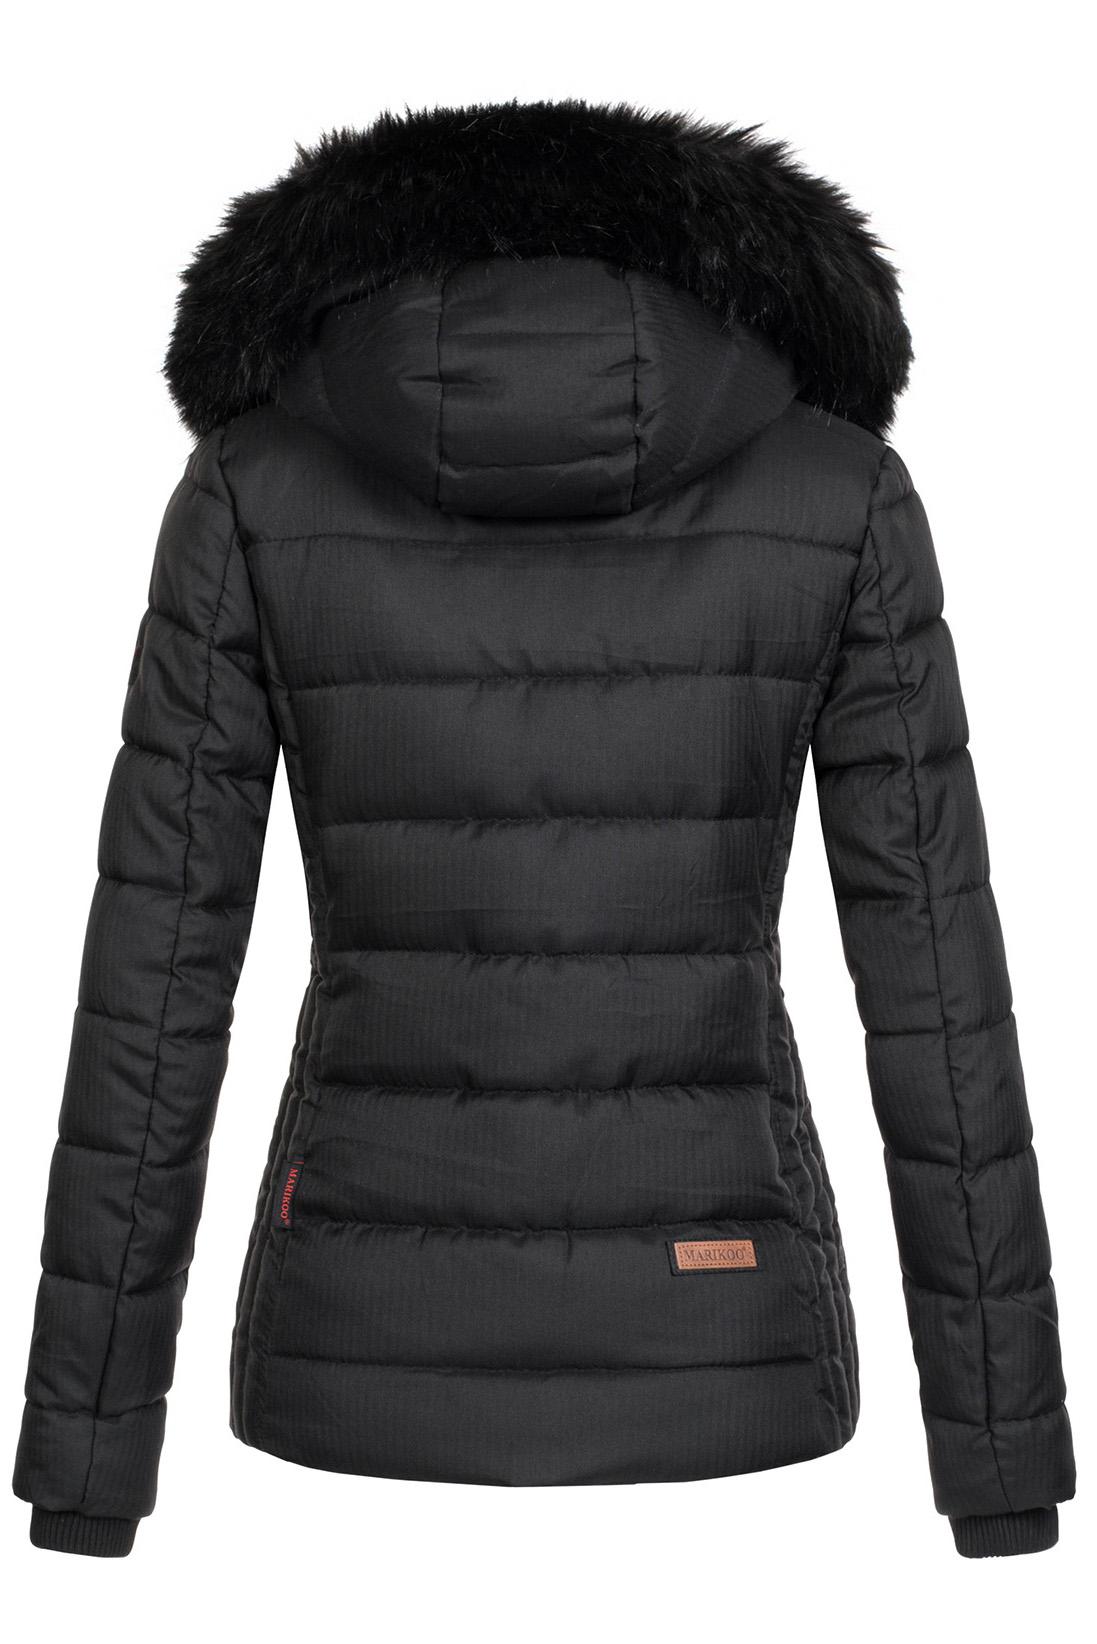 Marikoo-warme-Damen-Winter-Jacke-Steppjacke-Winterjacke-gesteppt-Parka-NEU-B391